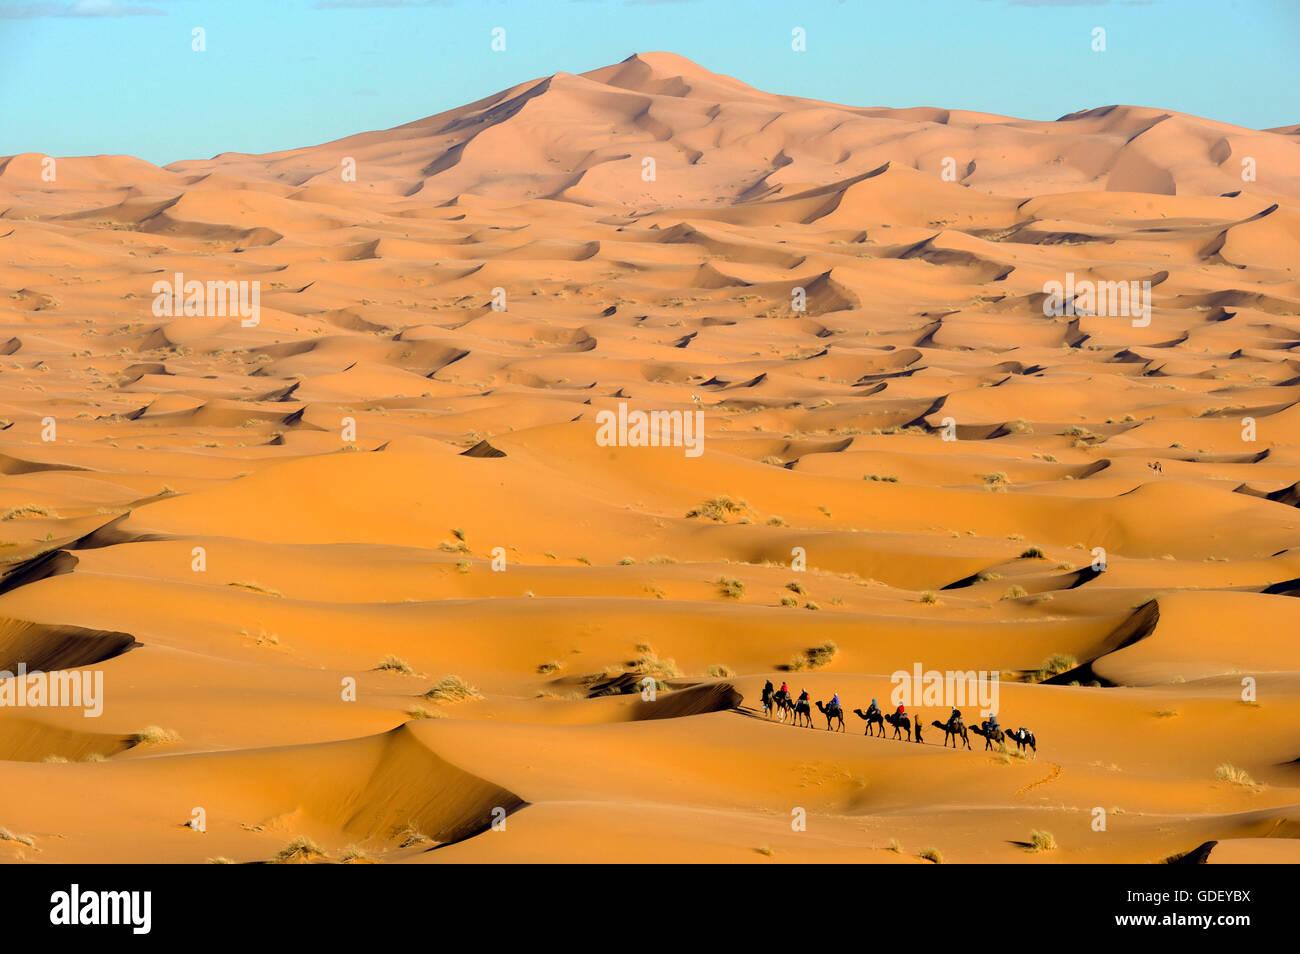 Marocco, Africa, cameleer, Desert Erg Chebbi, Dunes, - Stock Image